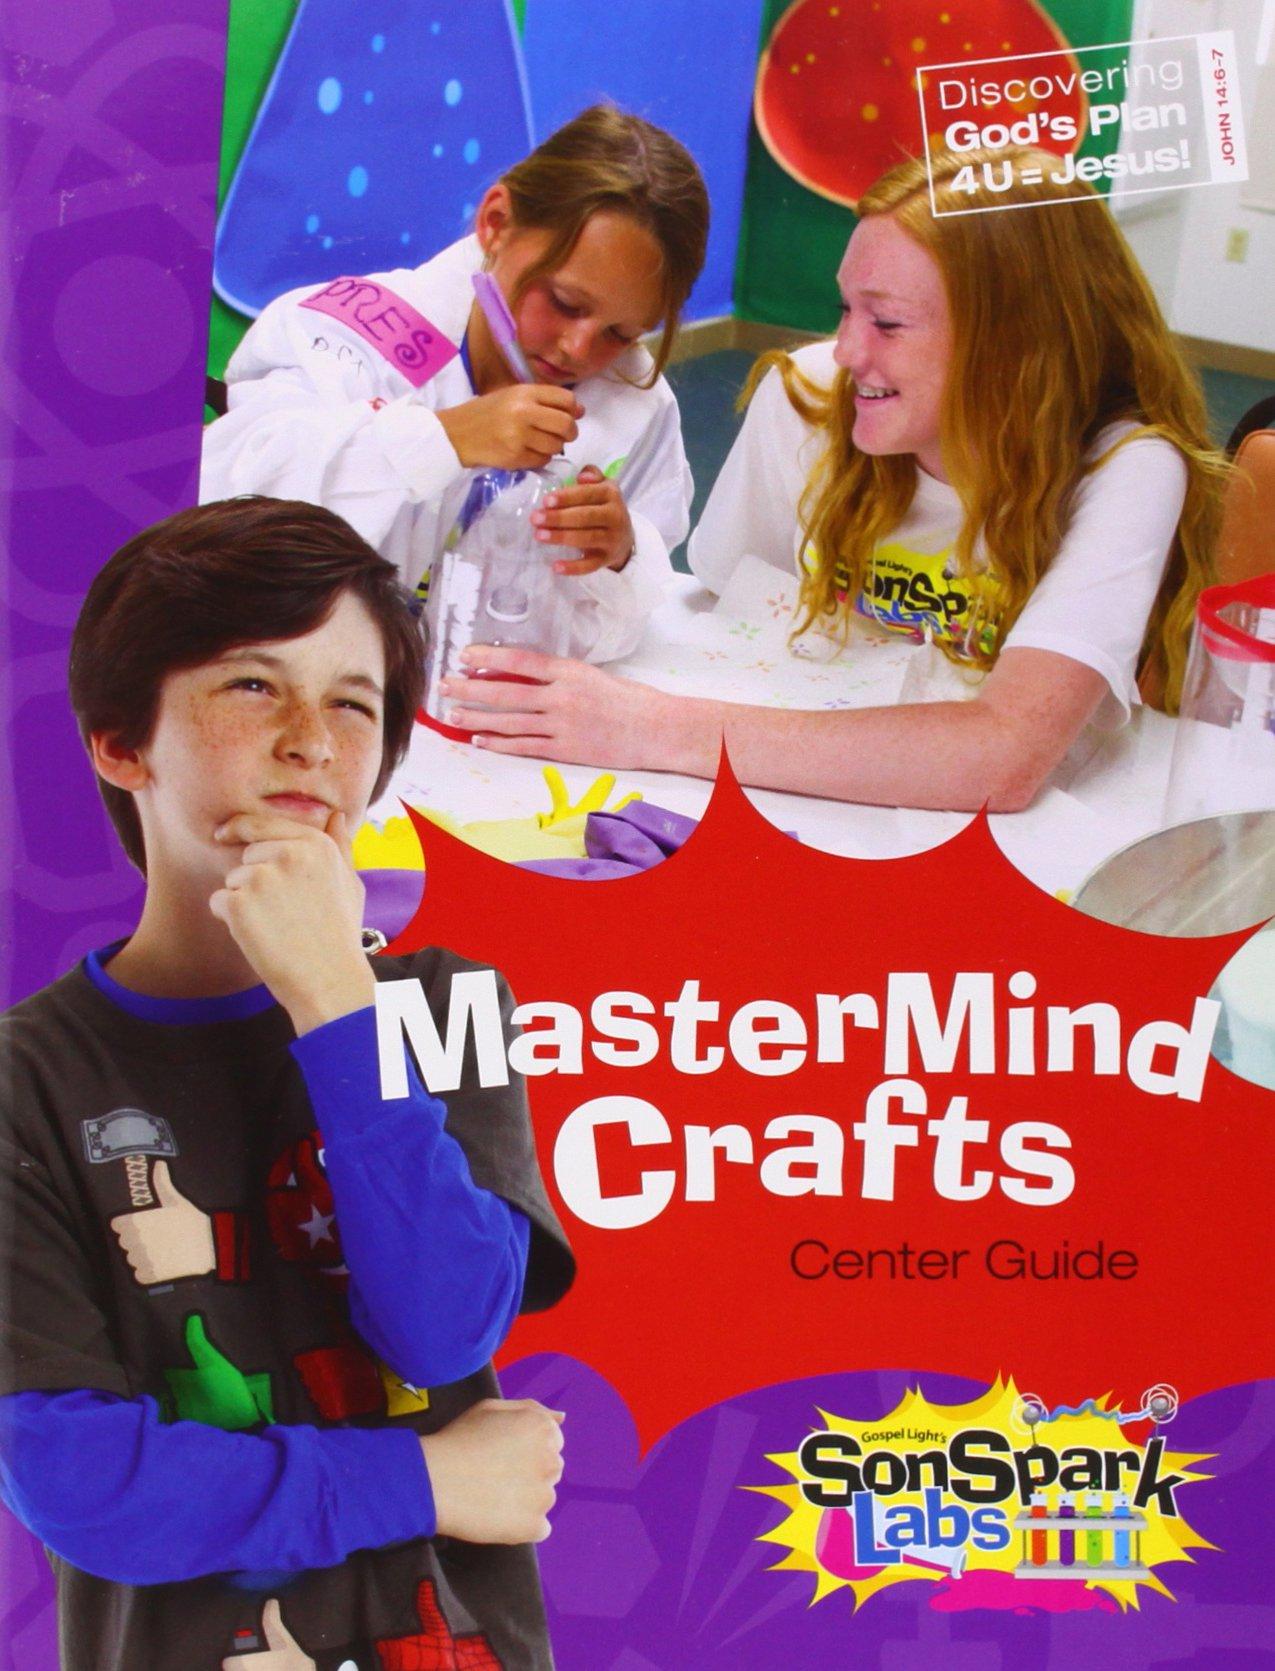 Sonspark Labs MasterMind Crafts 9780830768097 Amazon Books